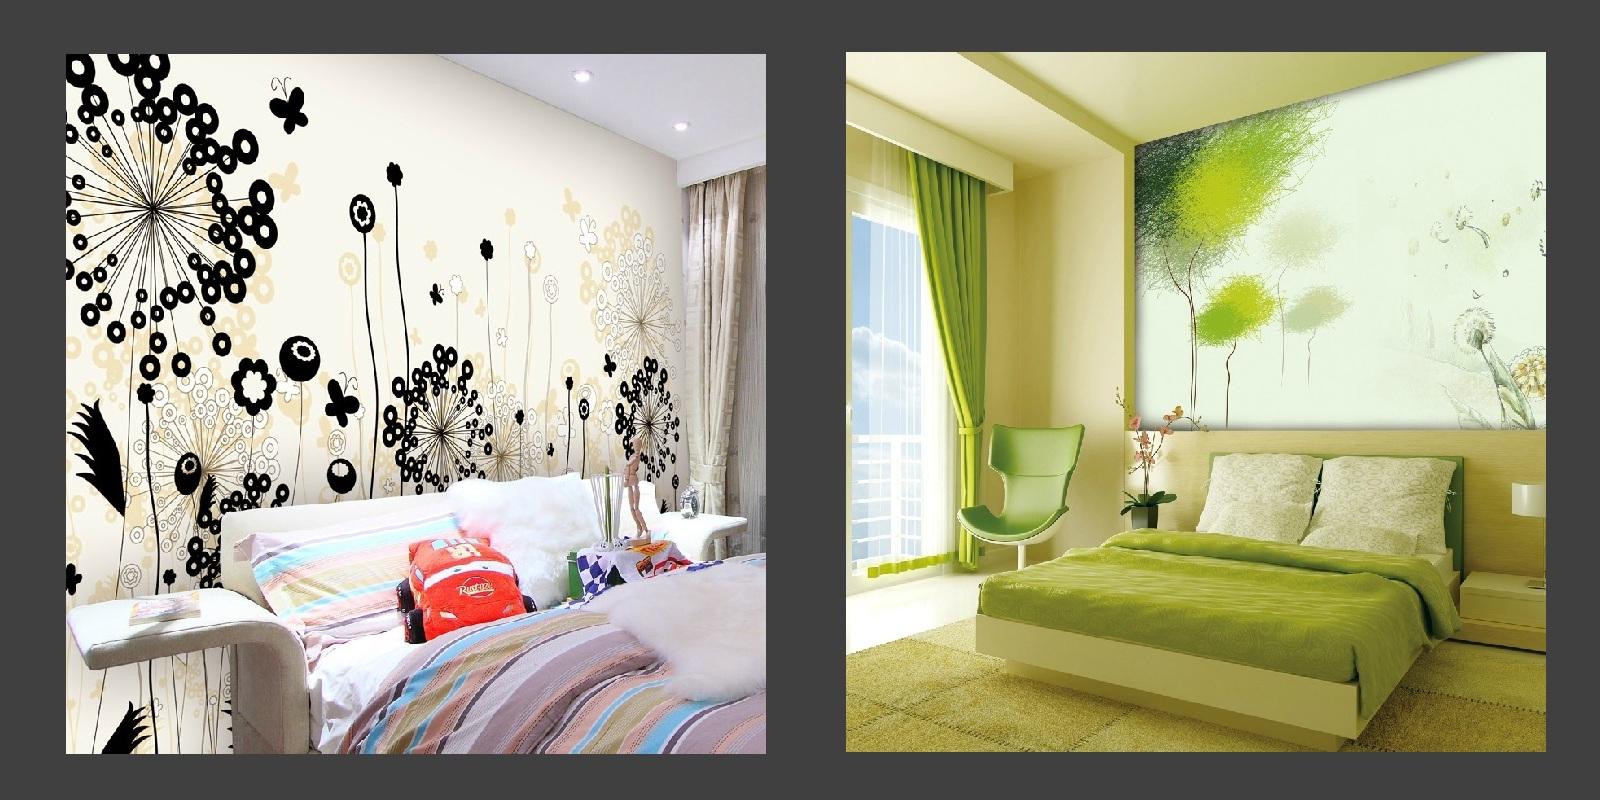 Wallpaper for home interiors wallpapersafari for Modern interior designs wallpapers